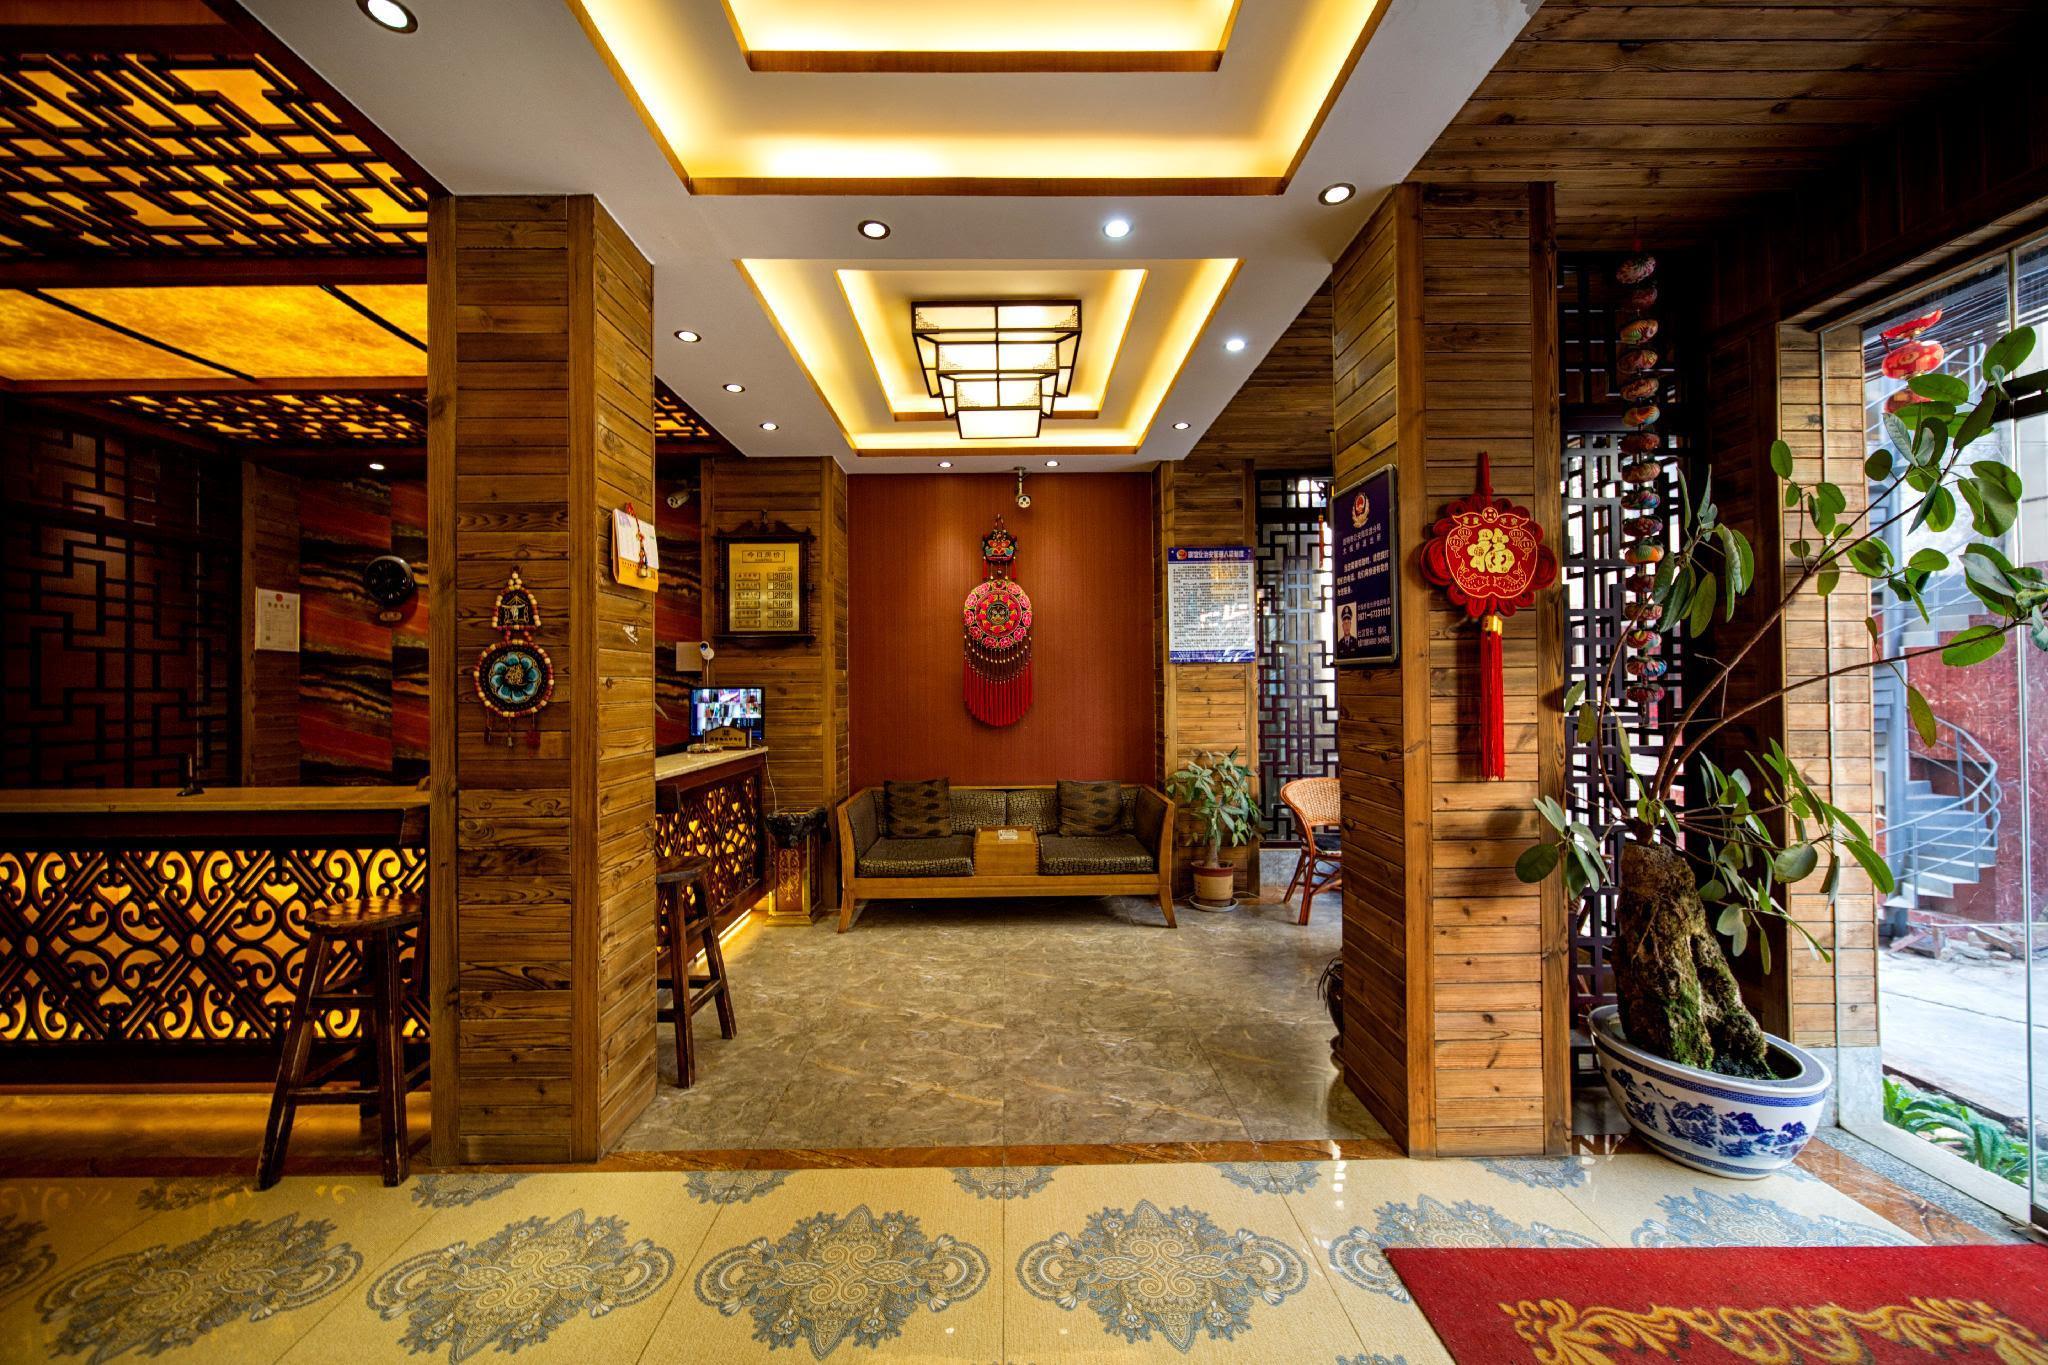 Review Xingyu Boutique Hotel